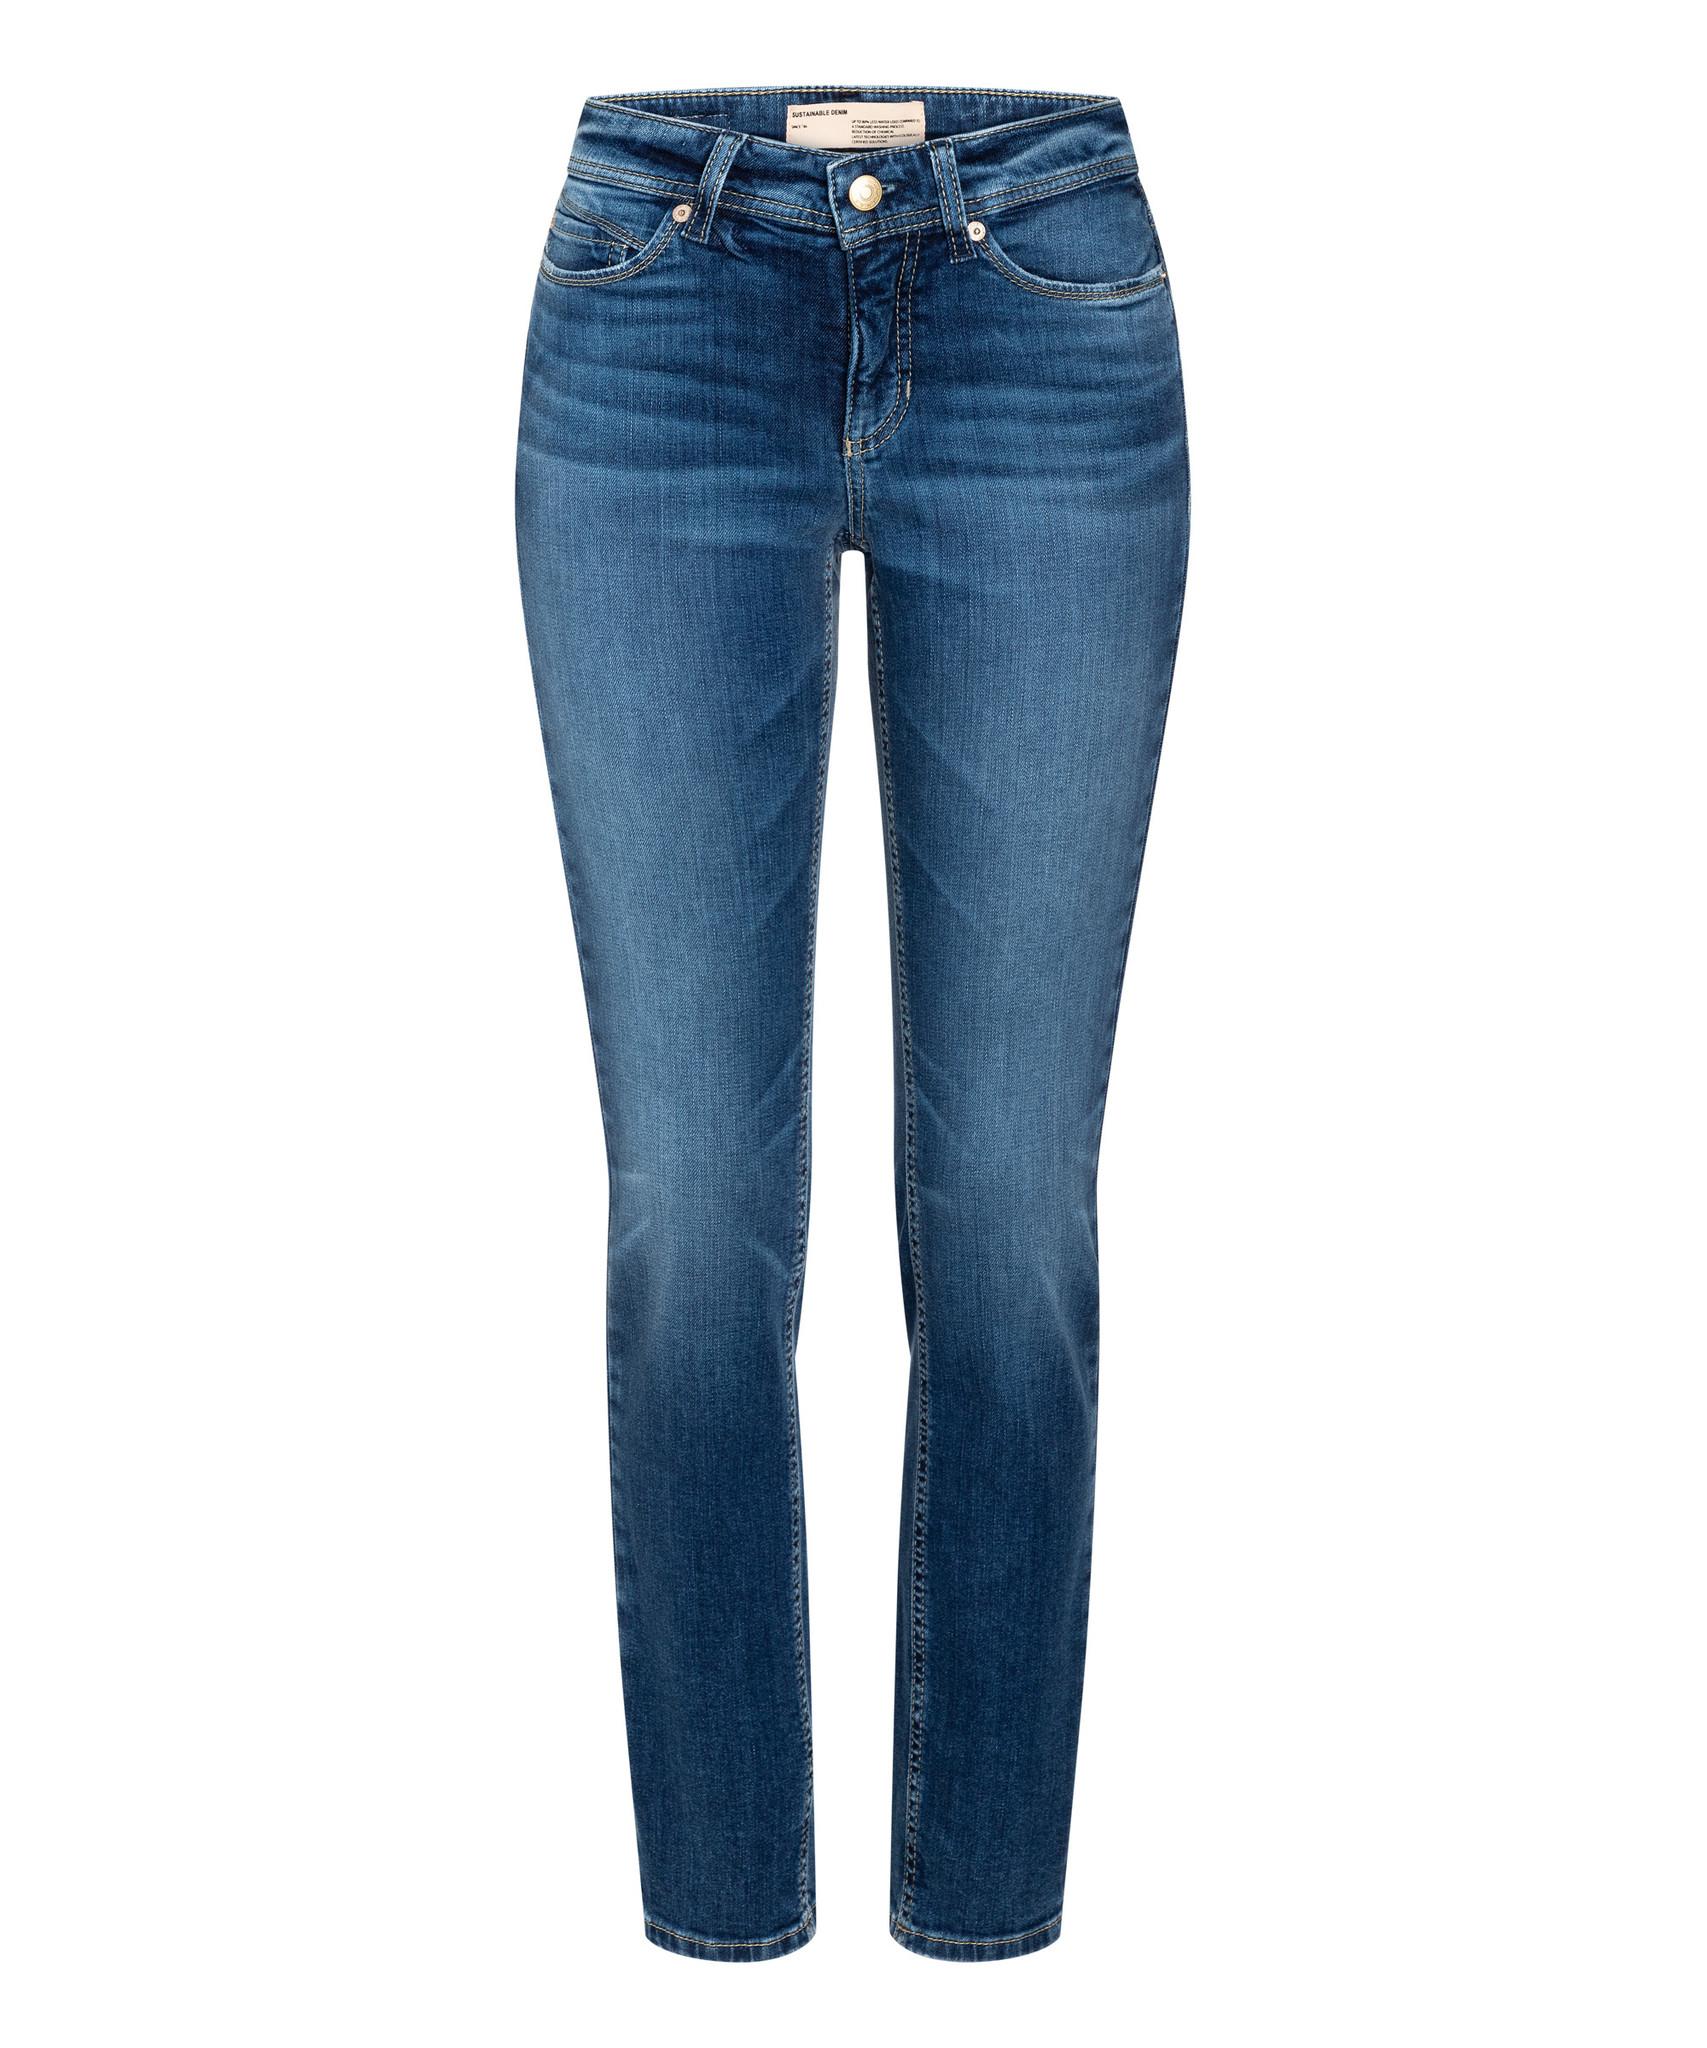 Cambio Jeans 9178G PARLA-1